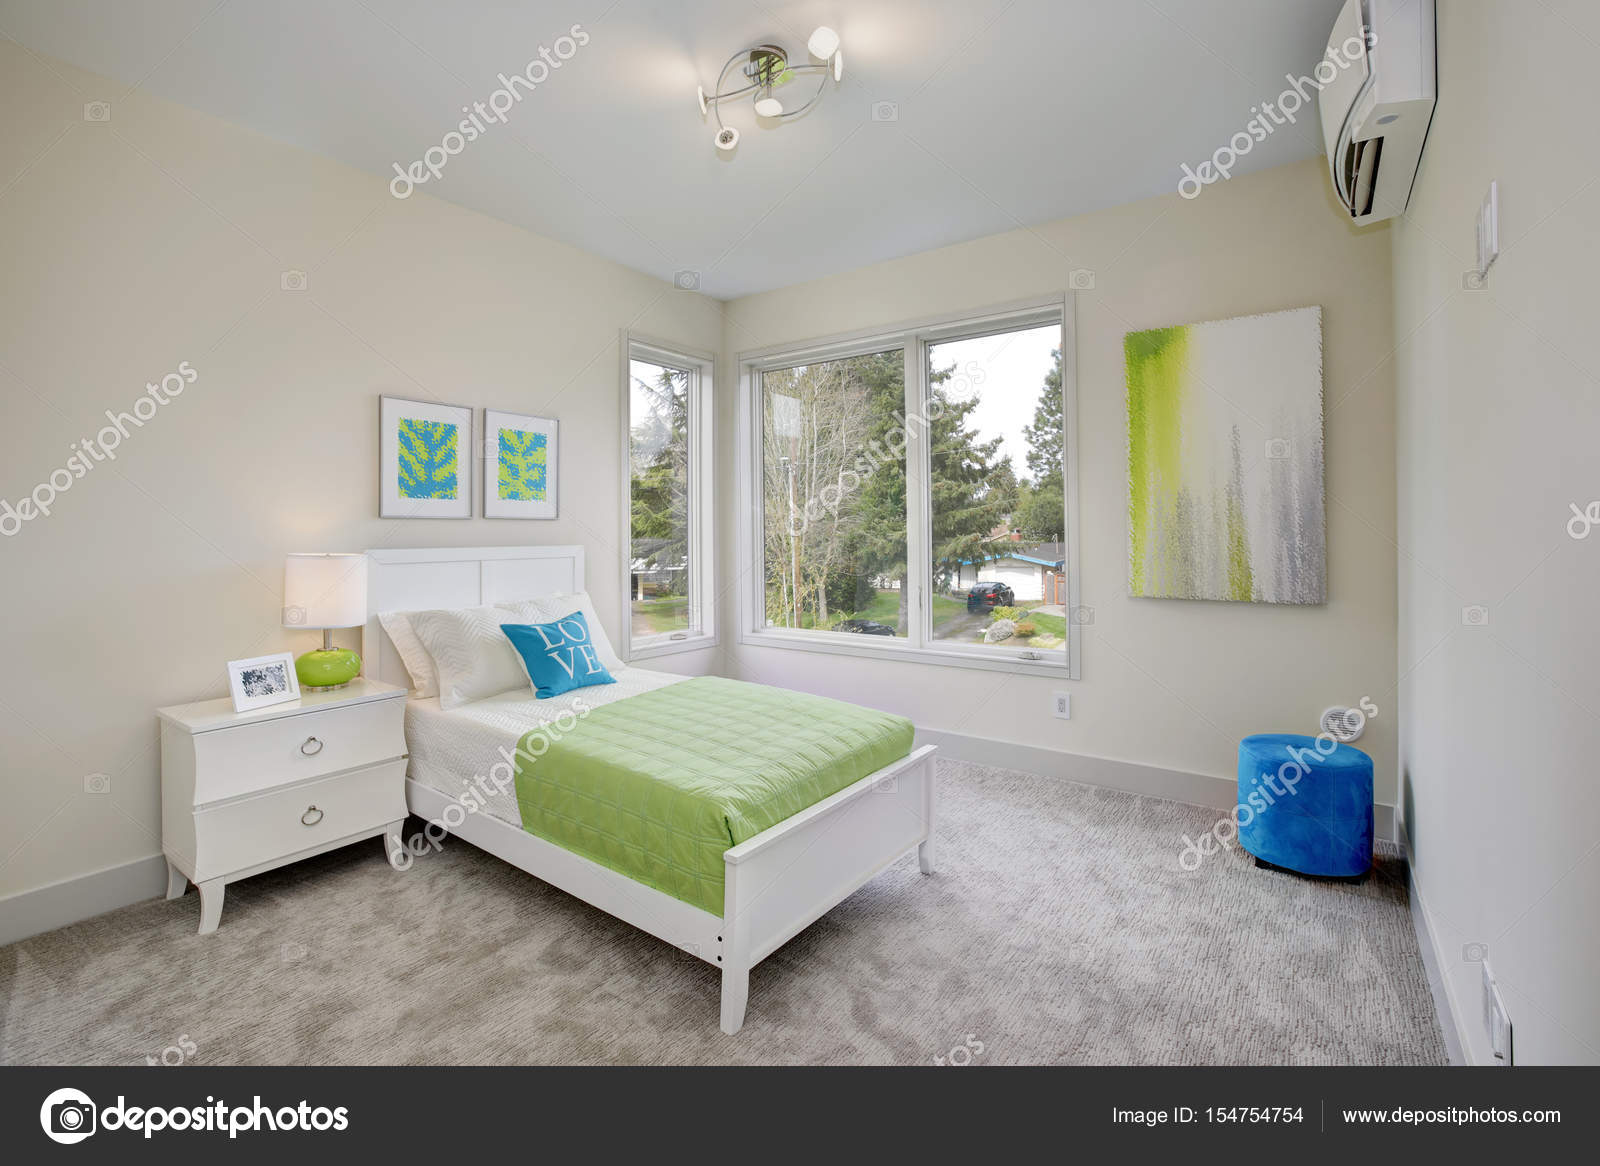 Eigentijds blauwe en groene kid s slaapkamer u stockfoto